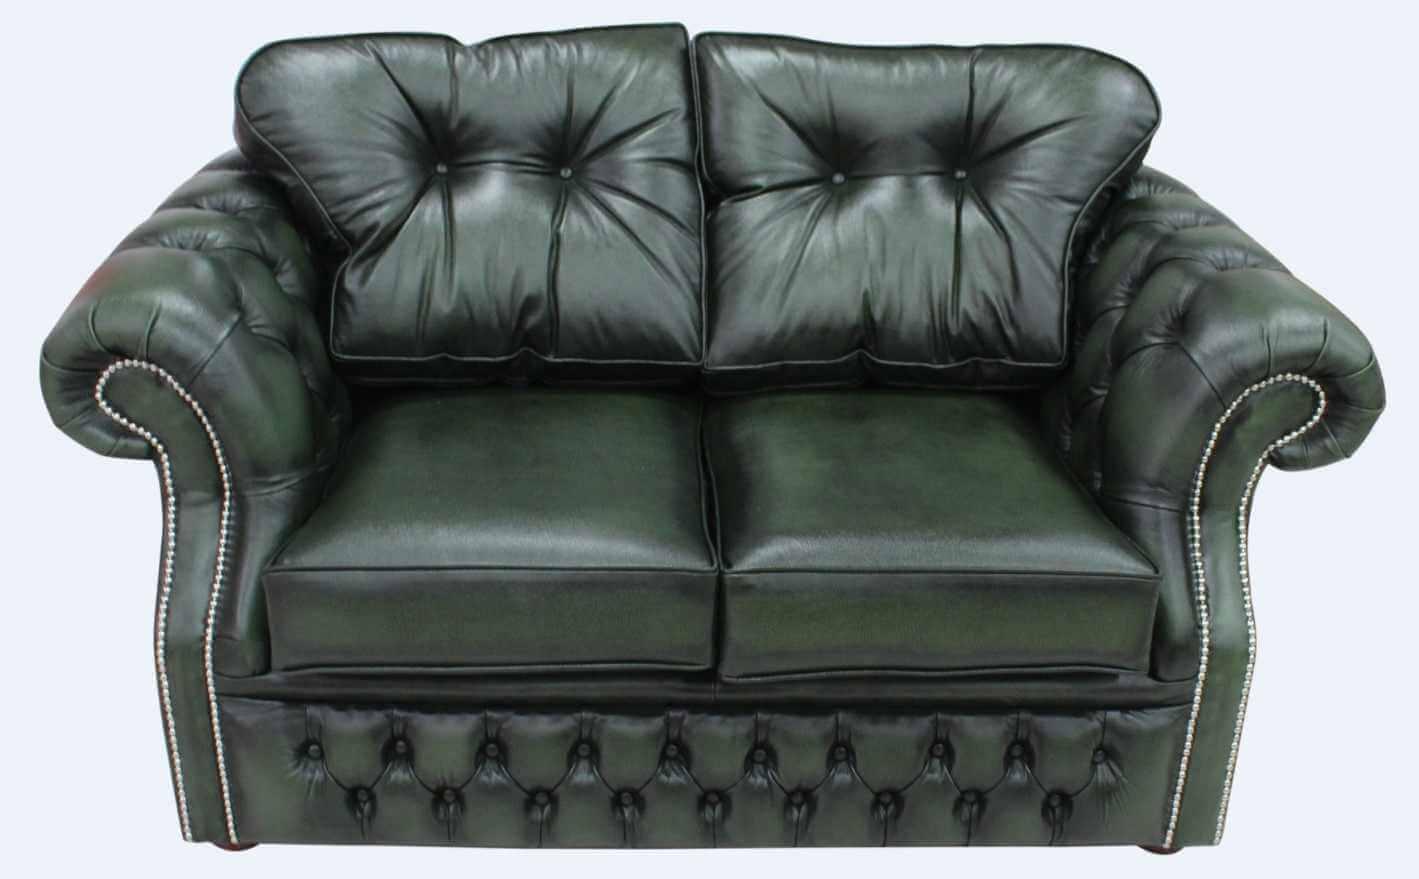 Buy Chesterfield Sofa Leather 2 Seat Settee Designersofas4u